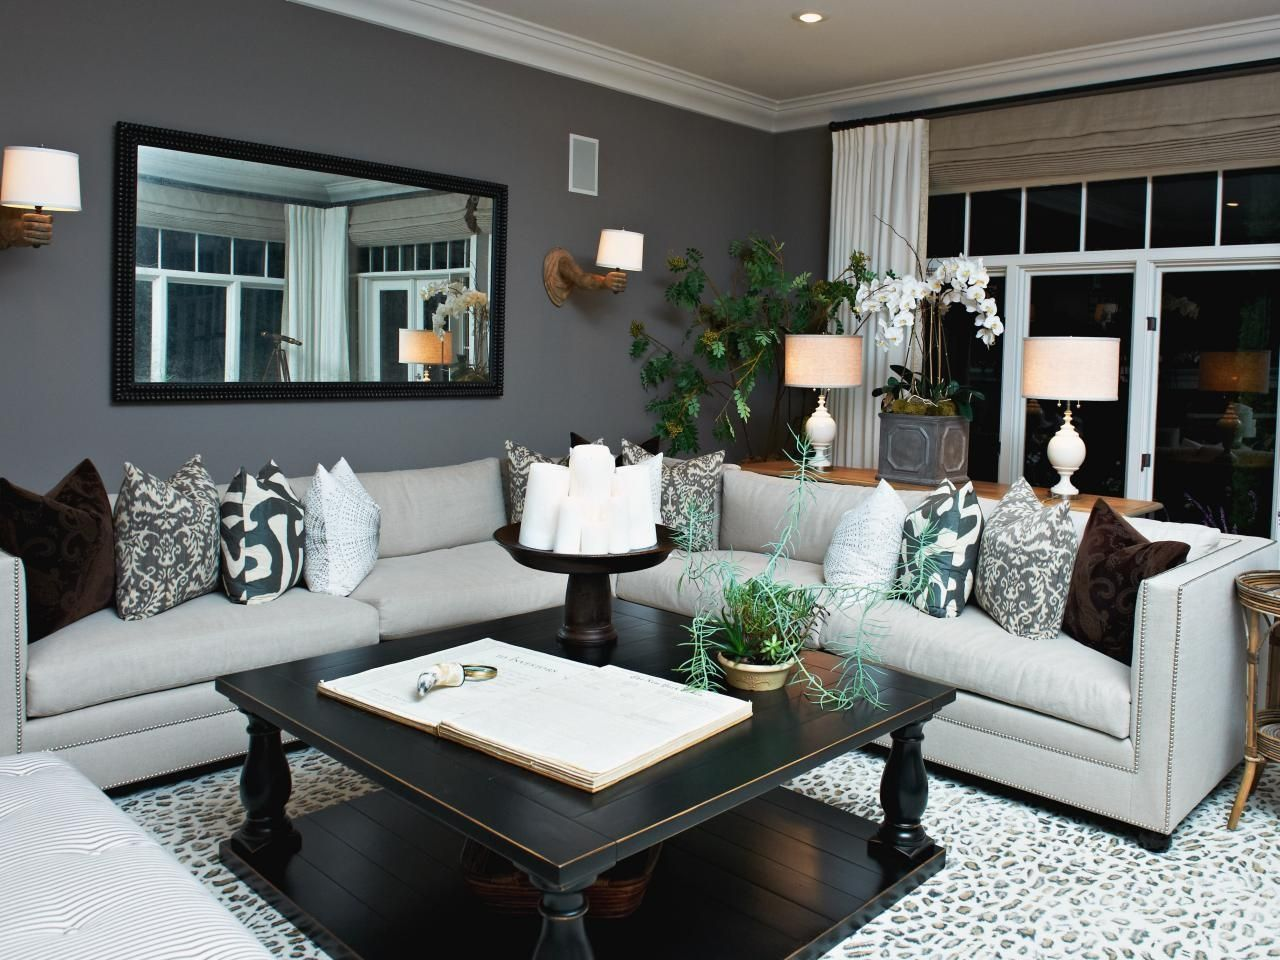 Cozy Living Room Ideas See More At Http Diningandlivingroom Com Home Decoration